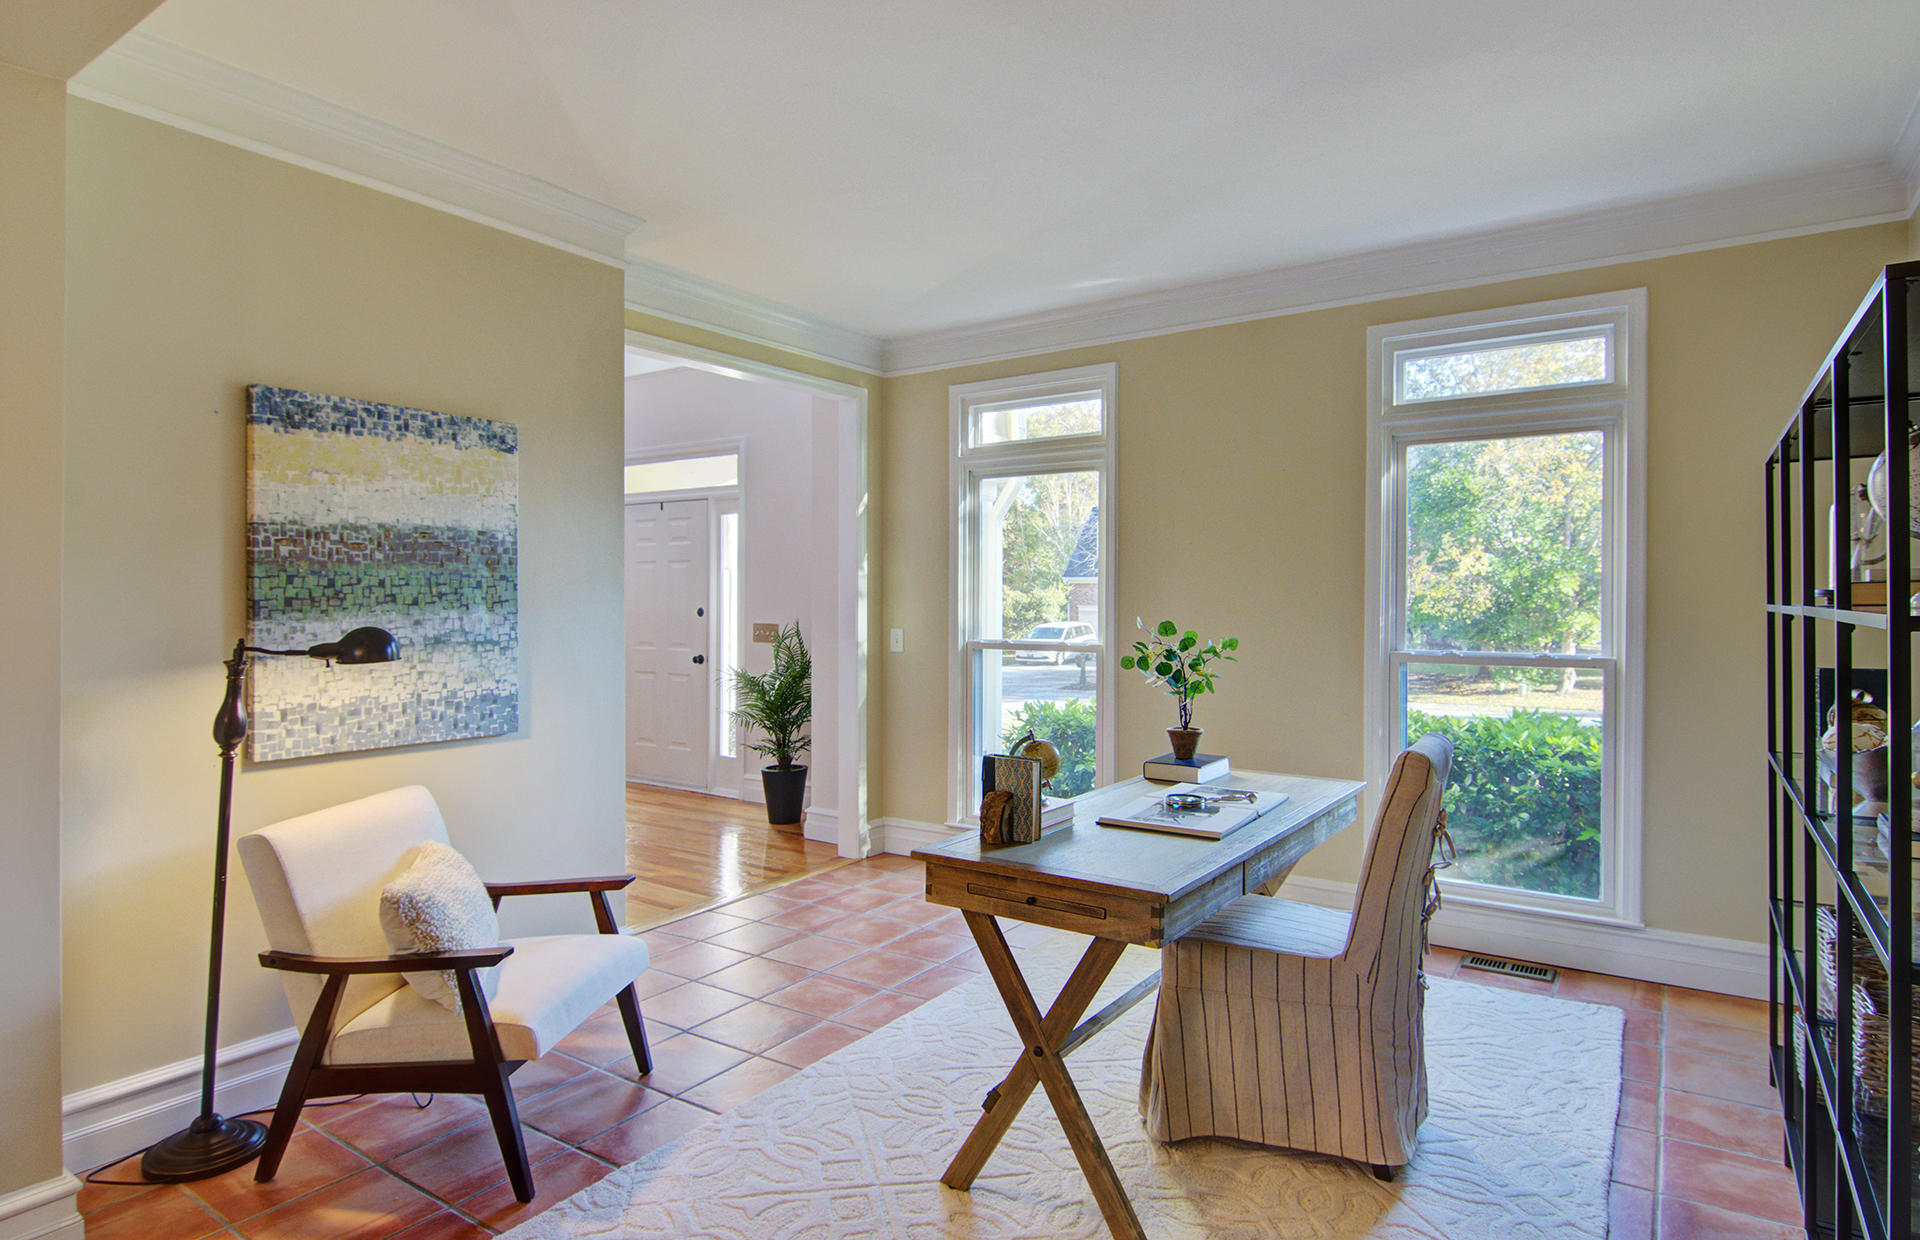 Brickyard Plantation Homes For Sale - 2796 Gaston Gate, Mount Pleasant, SC - 3